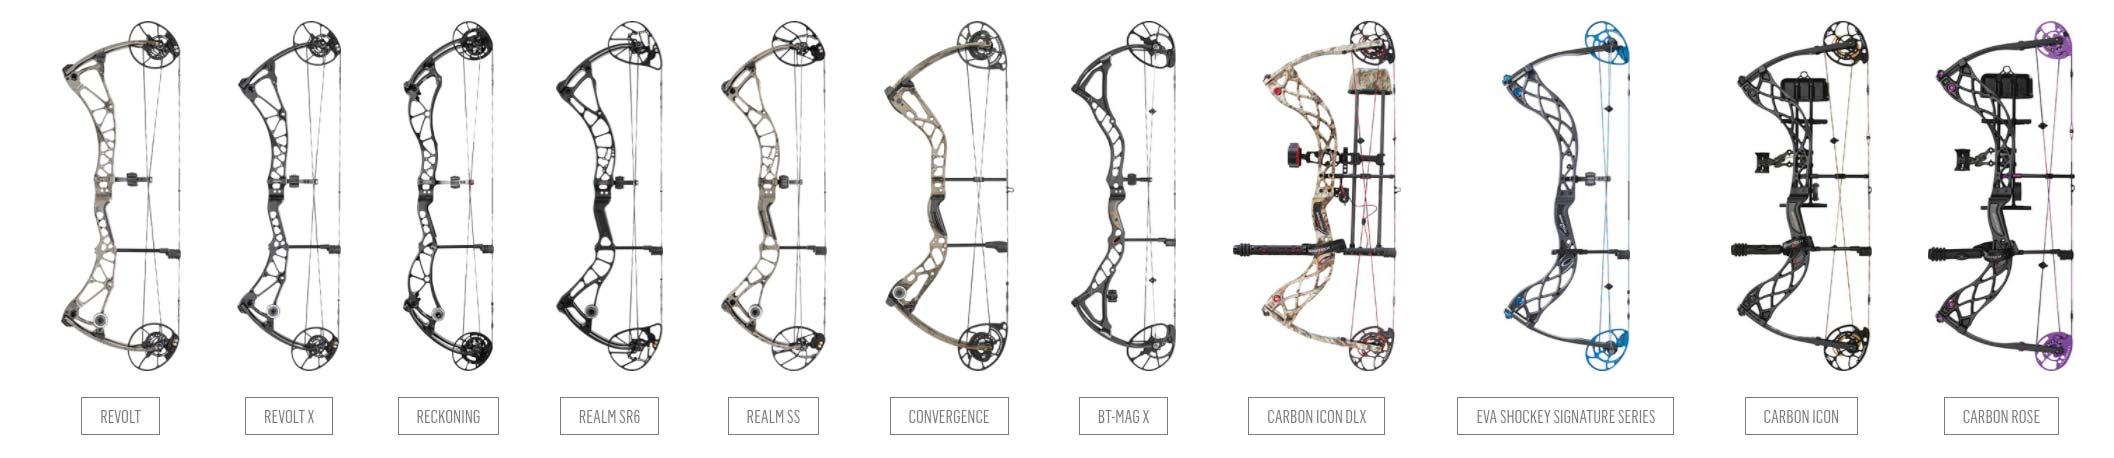 Bowtech 2020 Hunting Bows